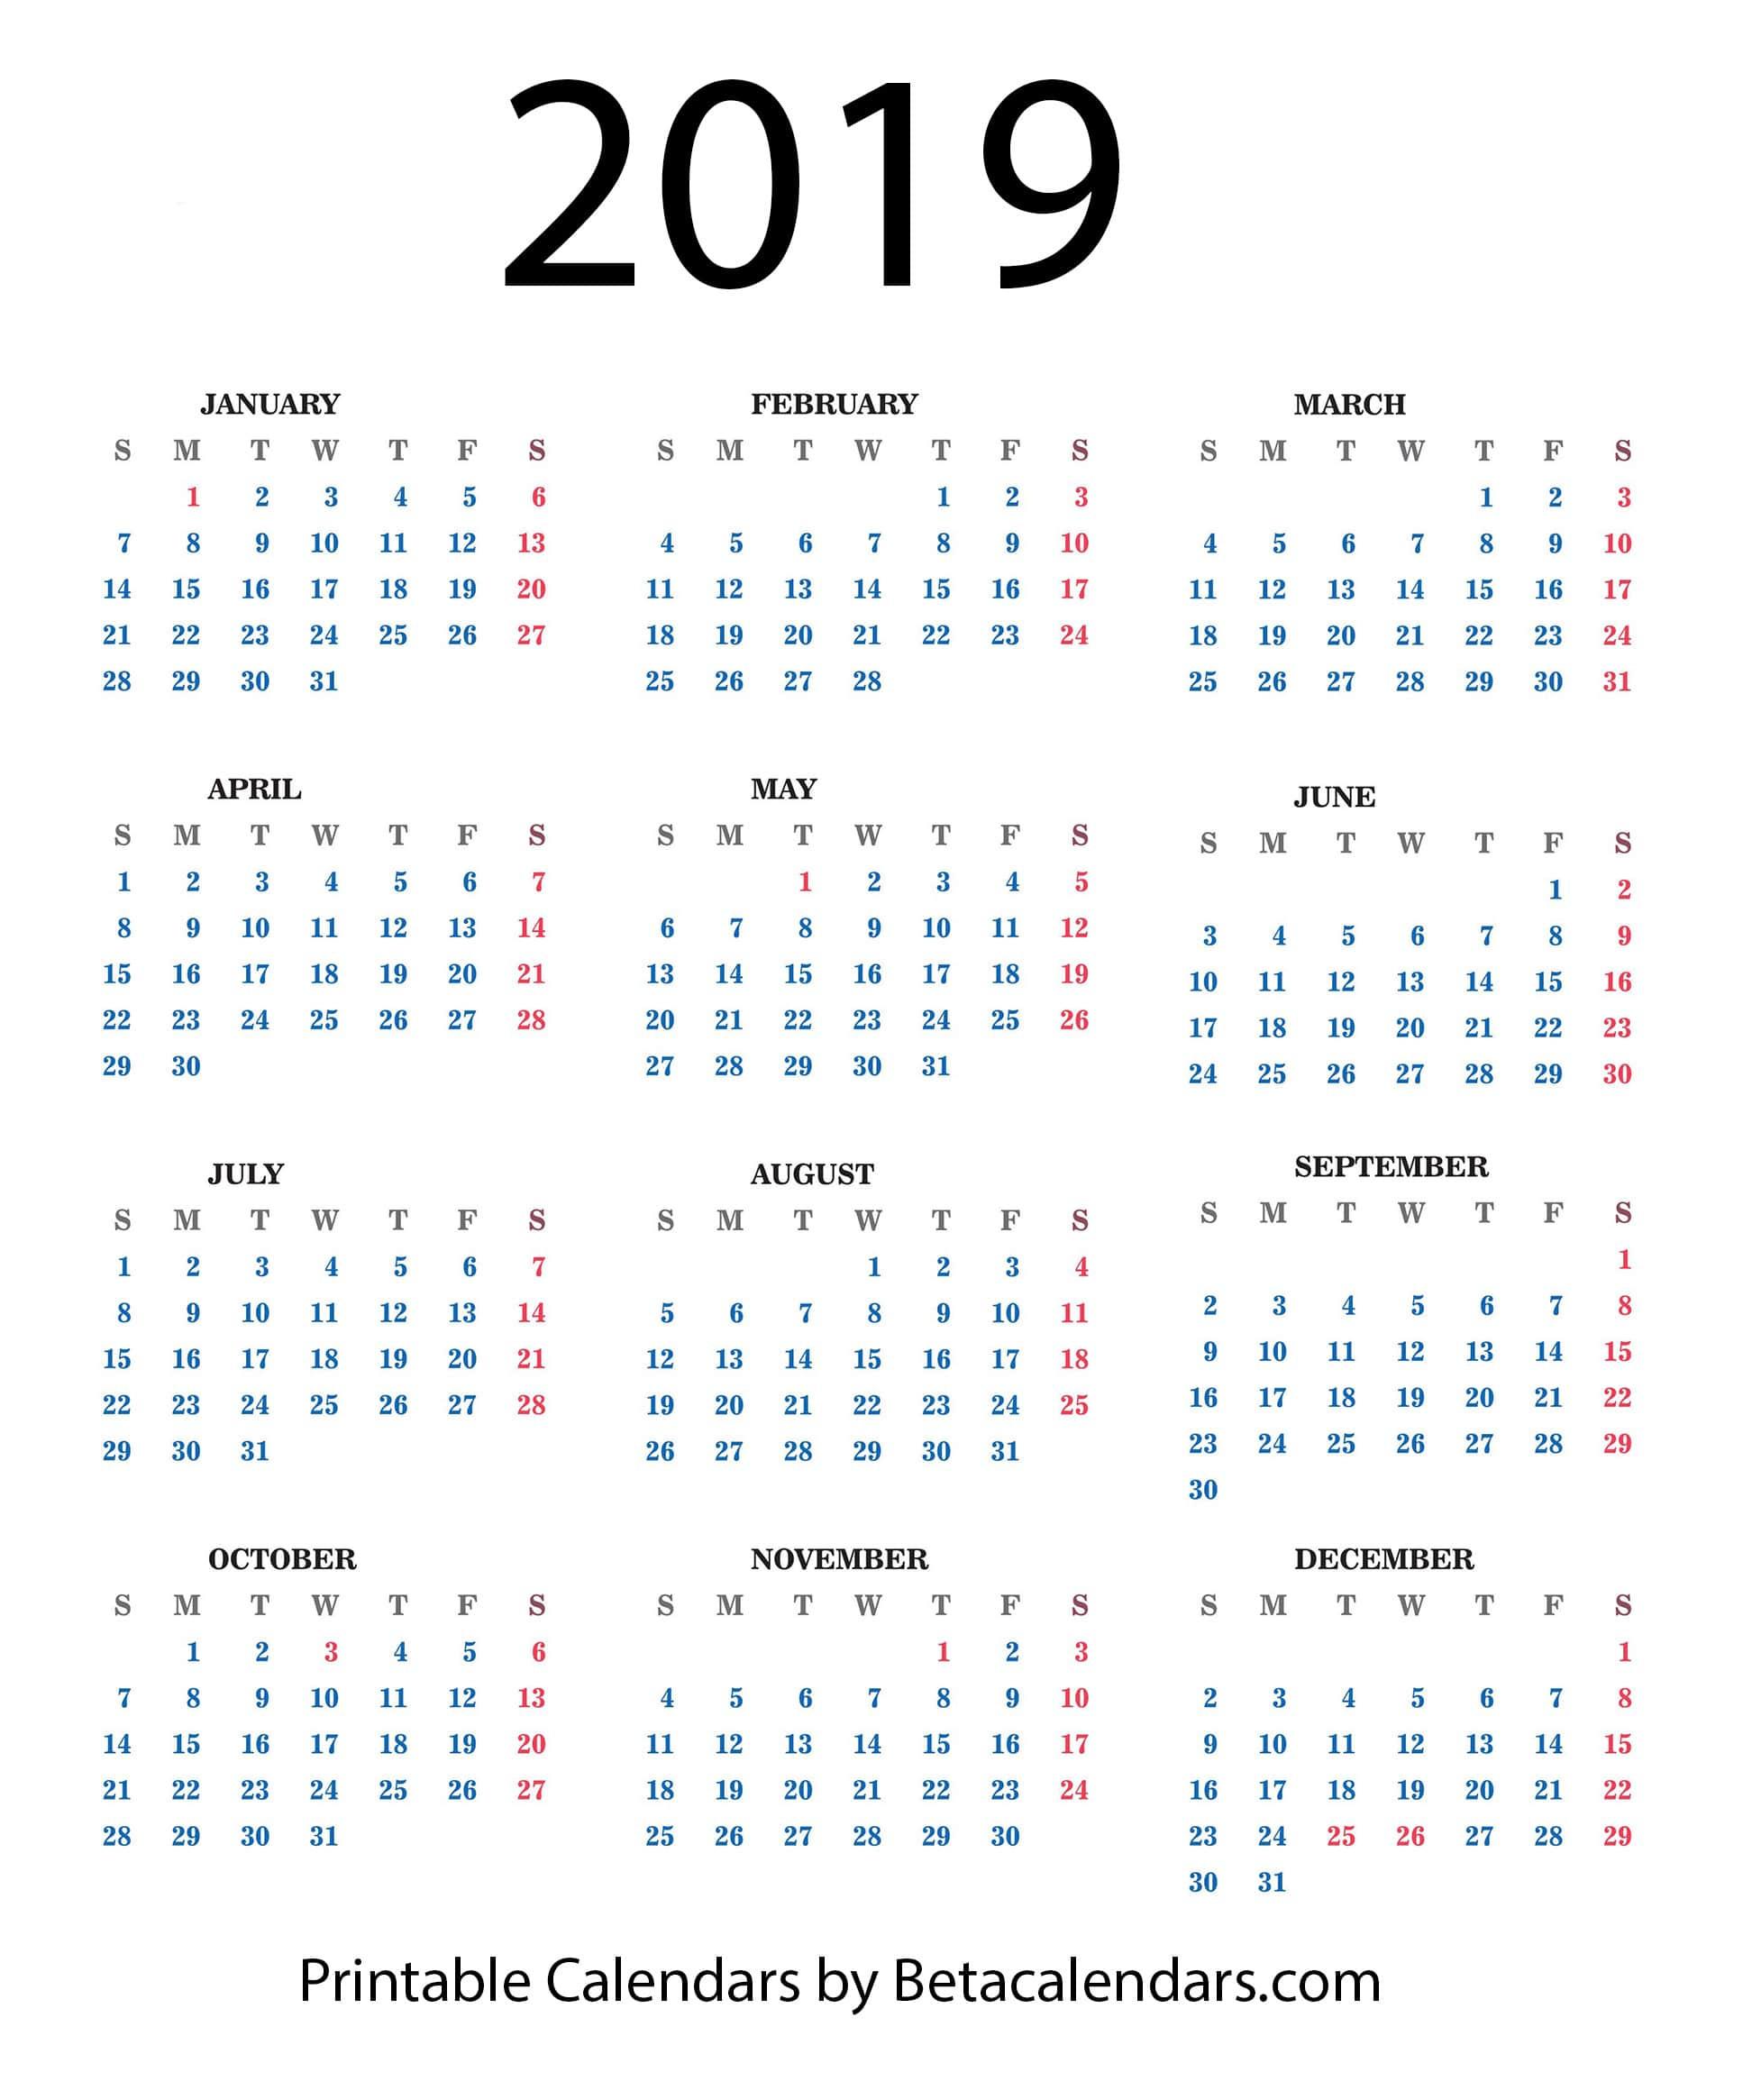 2019 Calendar - Beta Calendars_2019 Calendar Printing Johannesburg